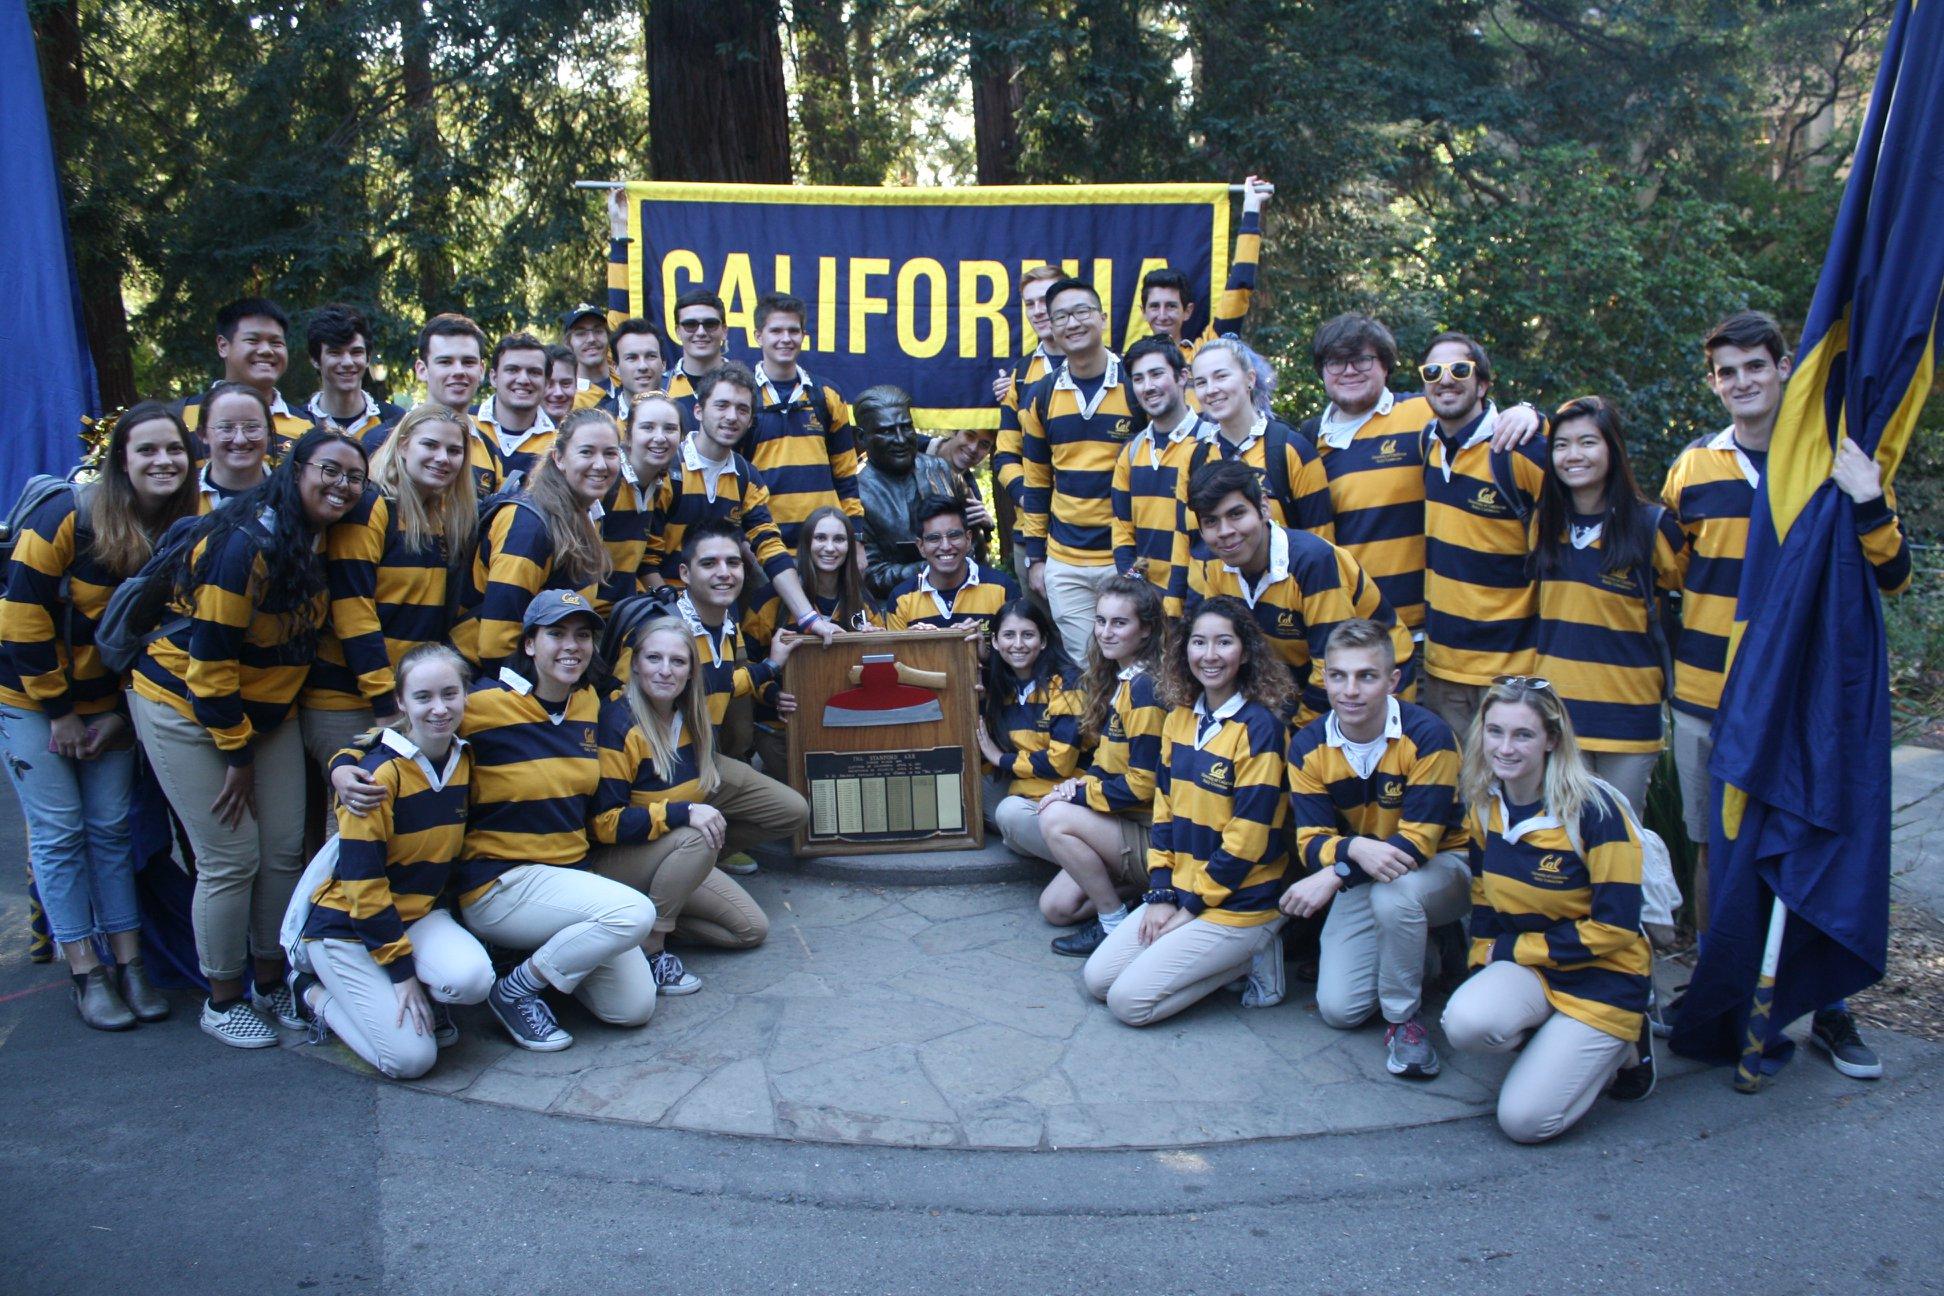 University of California Rally Committee